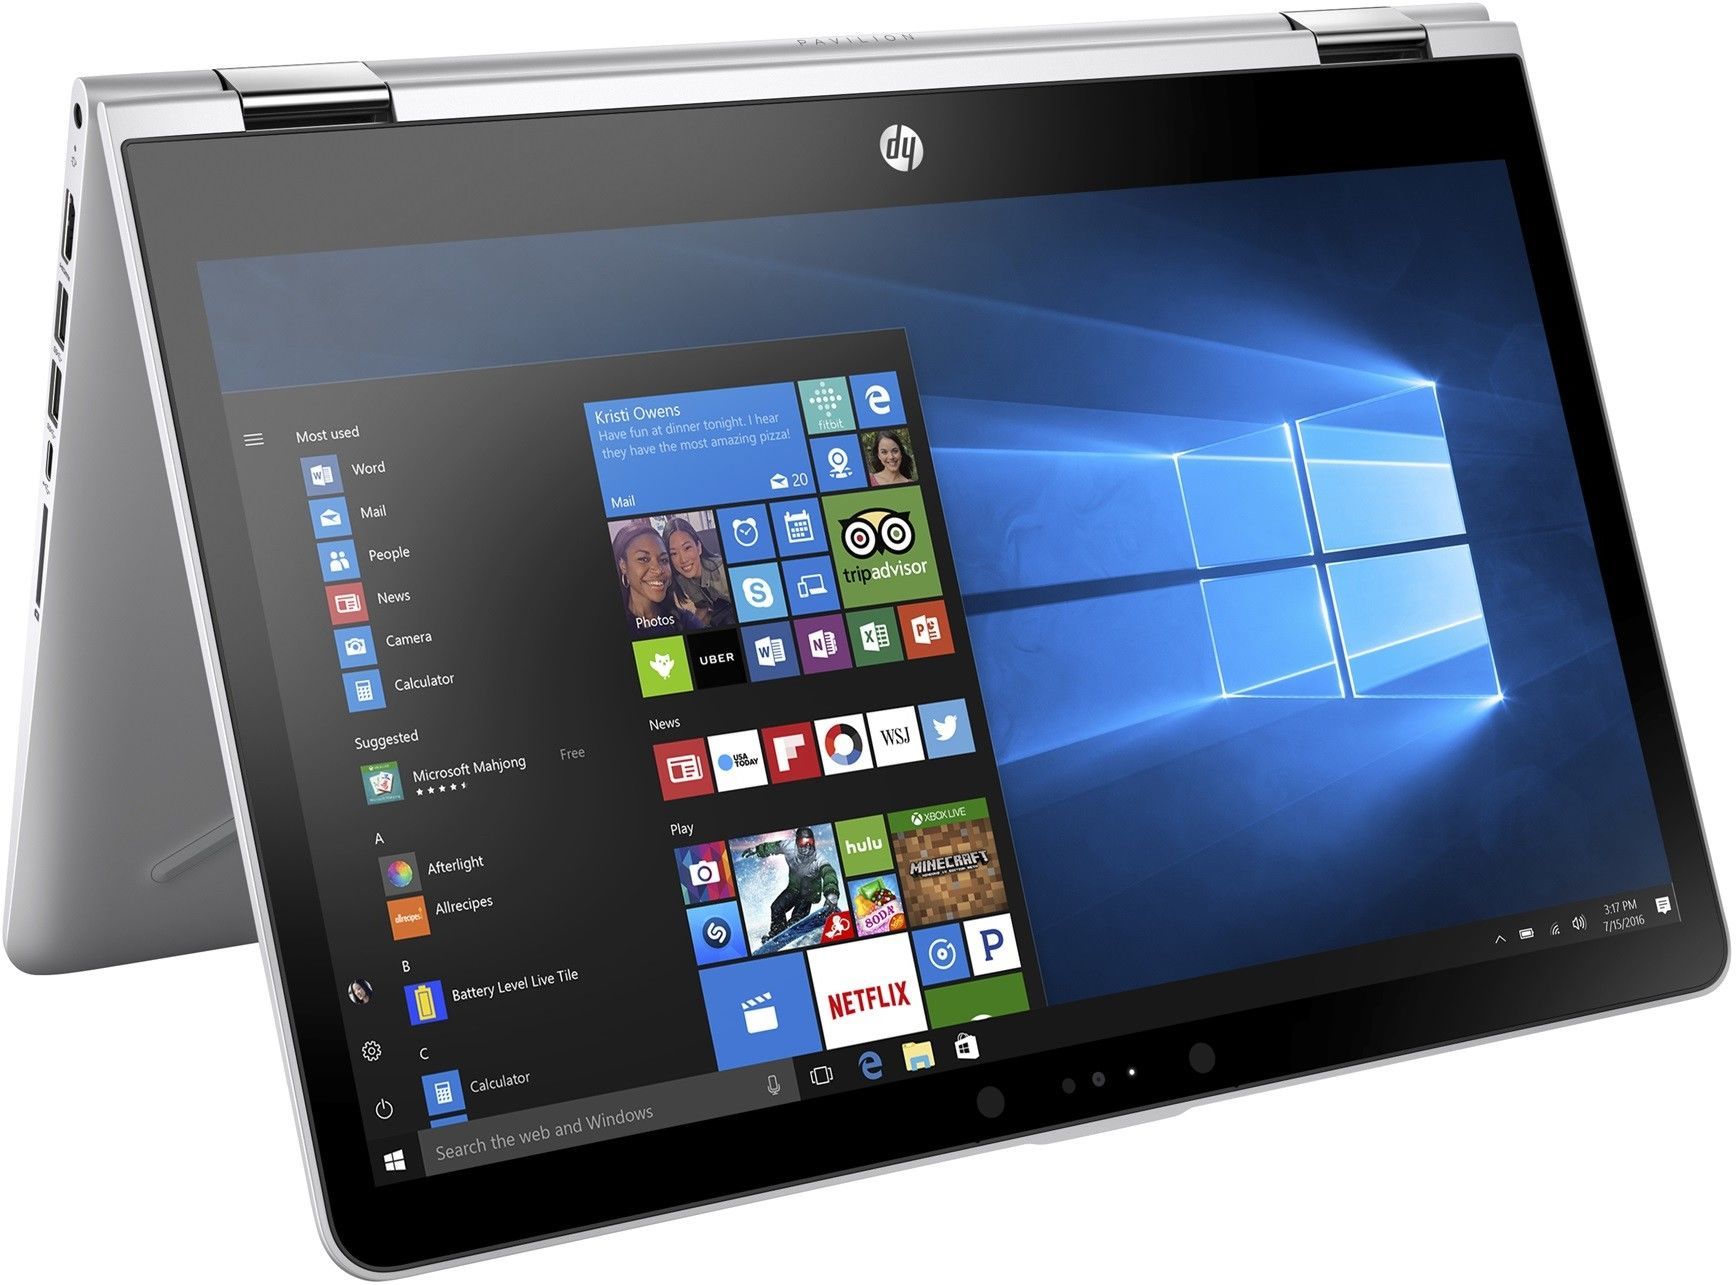 Laptop HP Pavilion x360 14-cd0006nw 4TY11EA